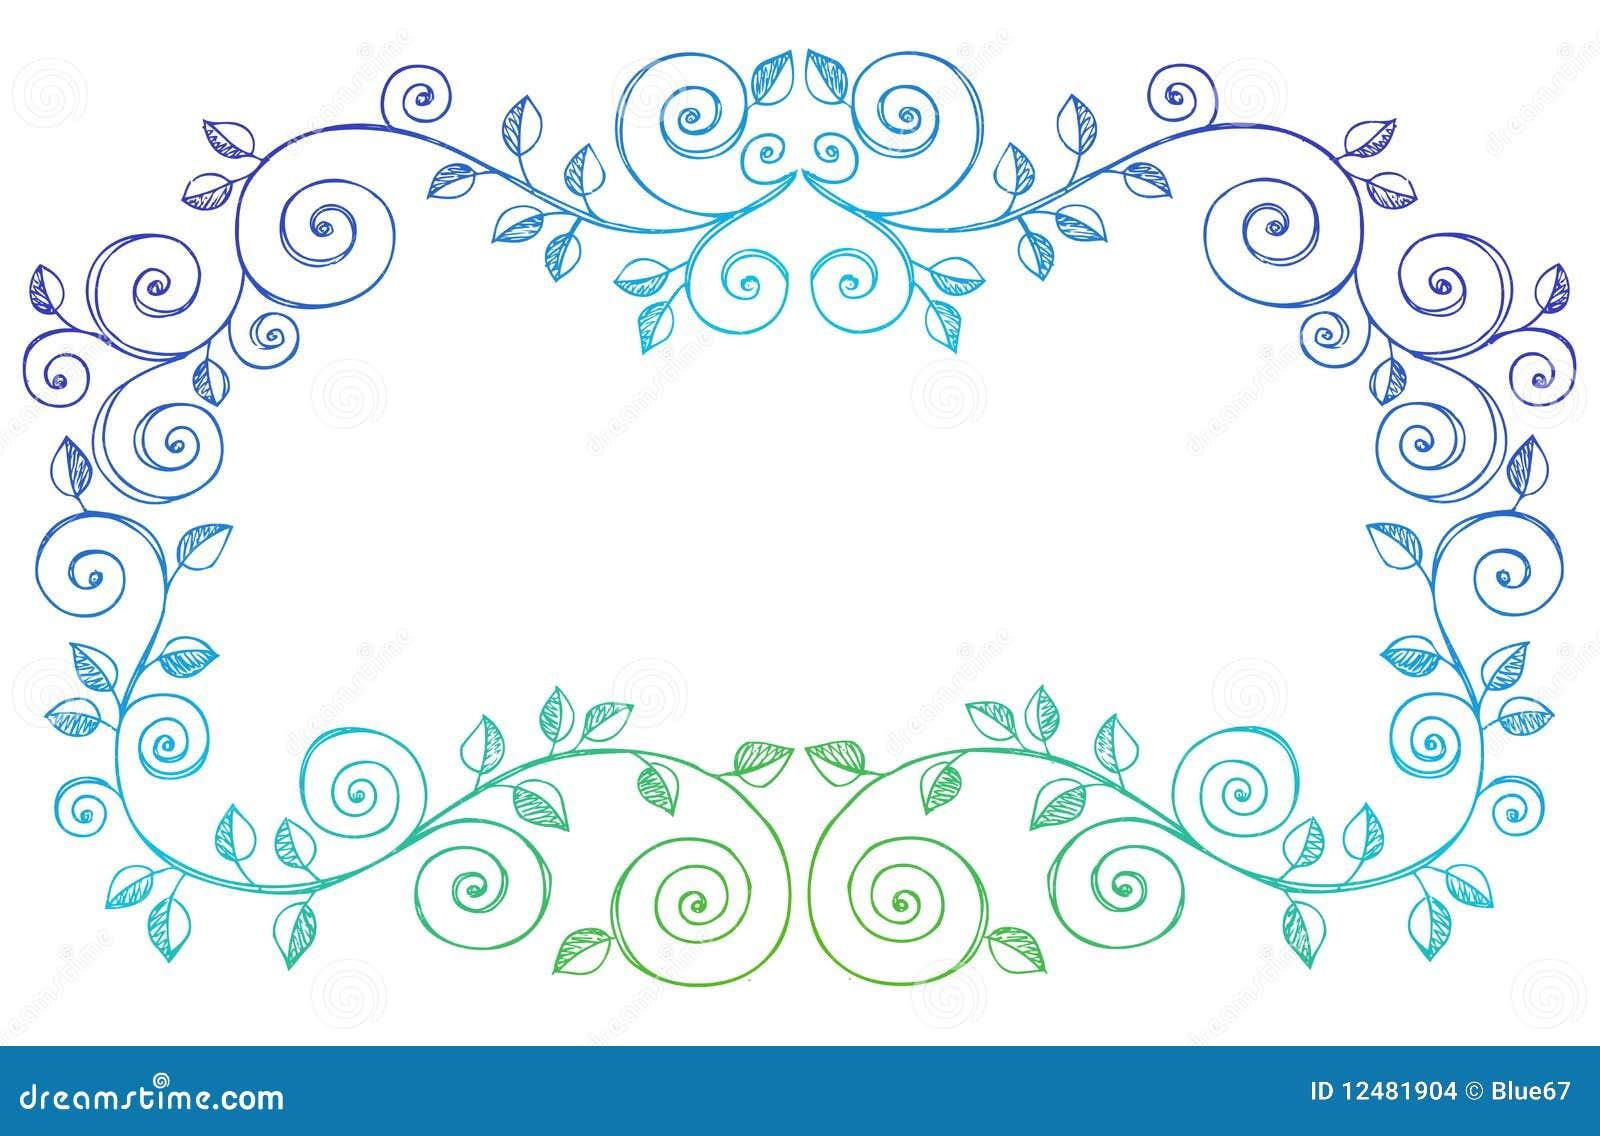 ... x3cb\x3eswirls\x3c/b\x3e vines \x3cb\x3eborder\x3c/b\x3e stock images: pixgood.com/swirls-border.html